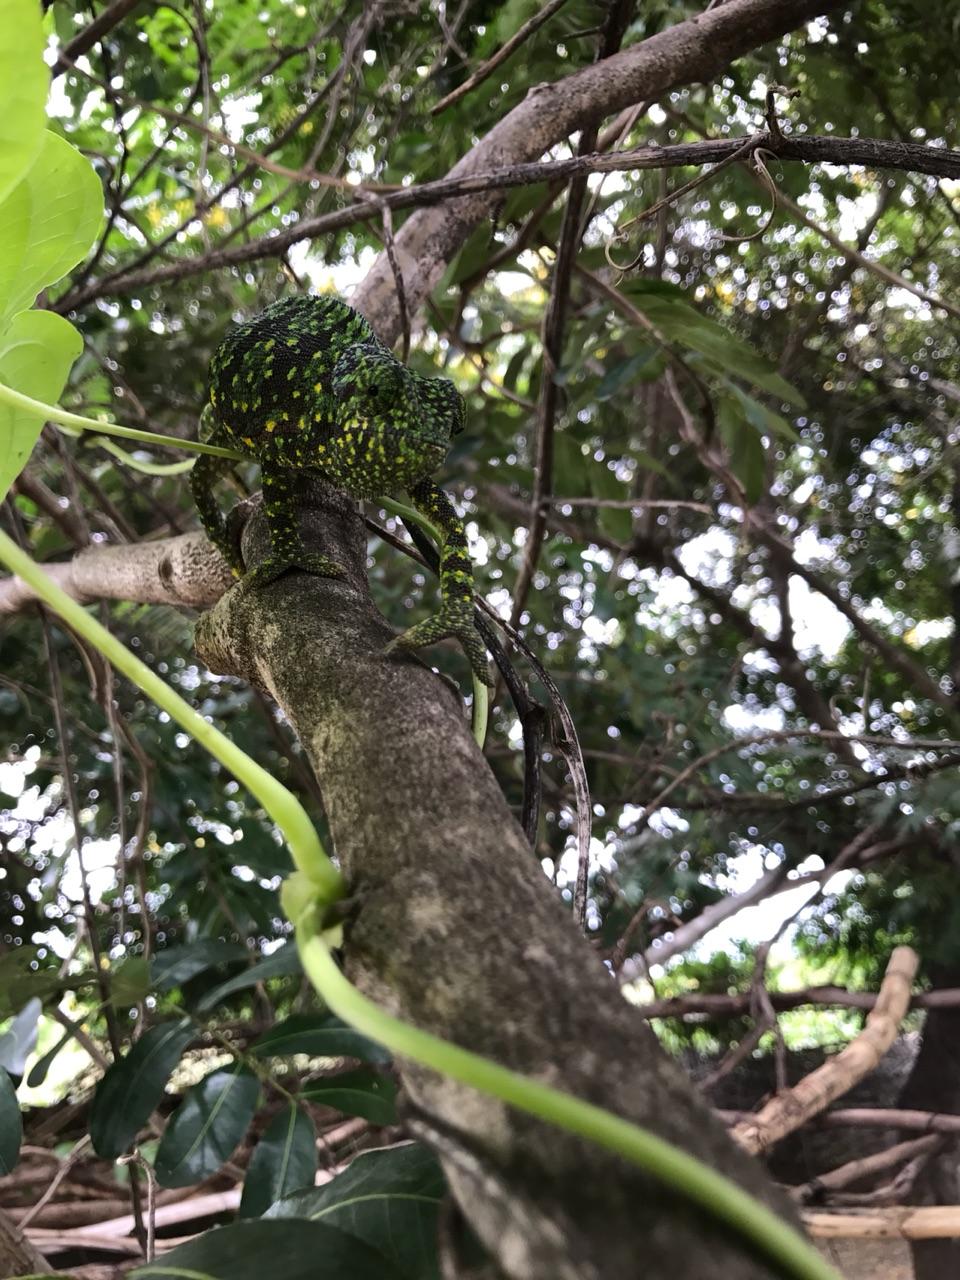 Cephas's new pet chameleon